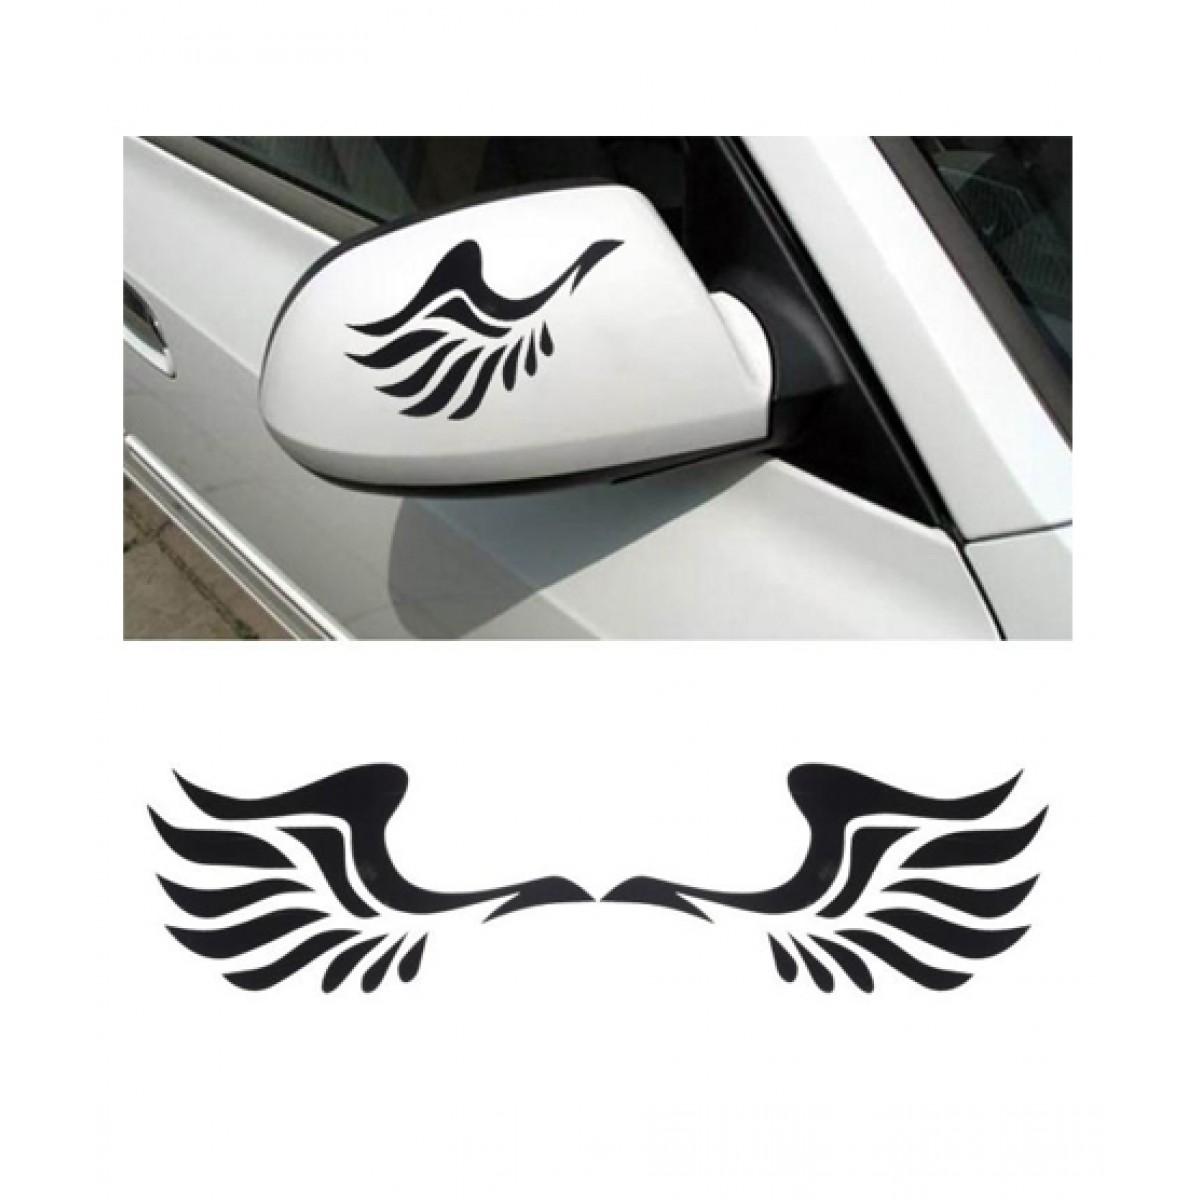 Wish hub mirror pair of wings car sticker price in pakistan buy wish hub mirror car sticker black ishopping pk